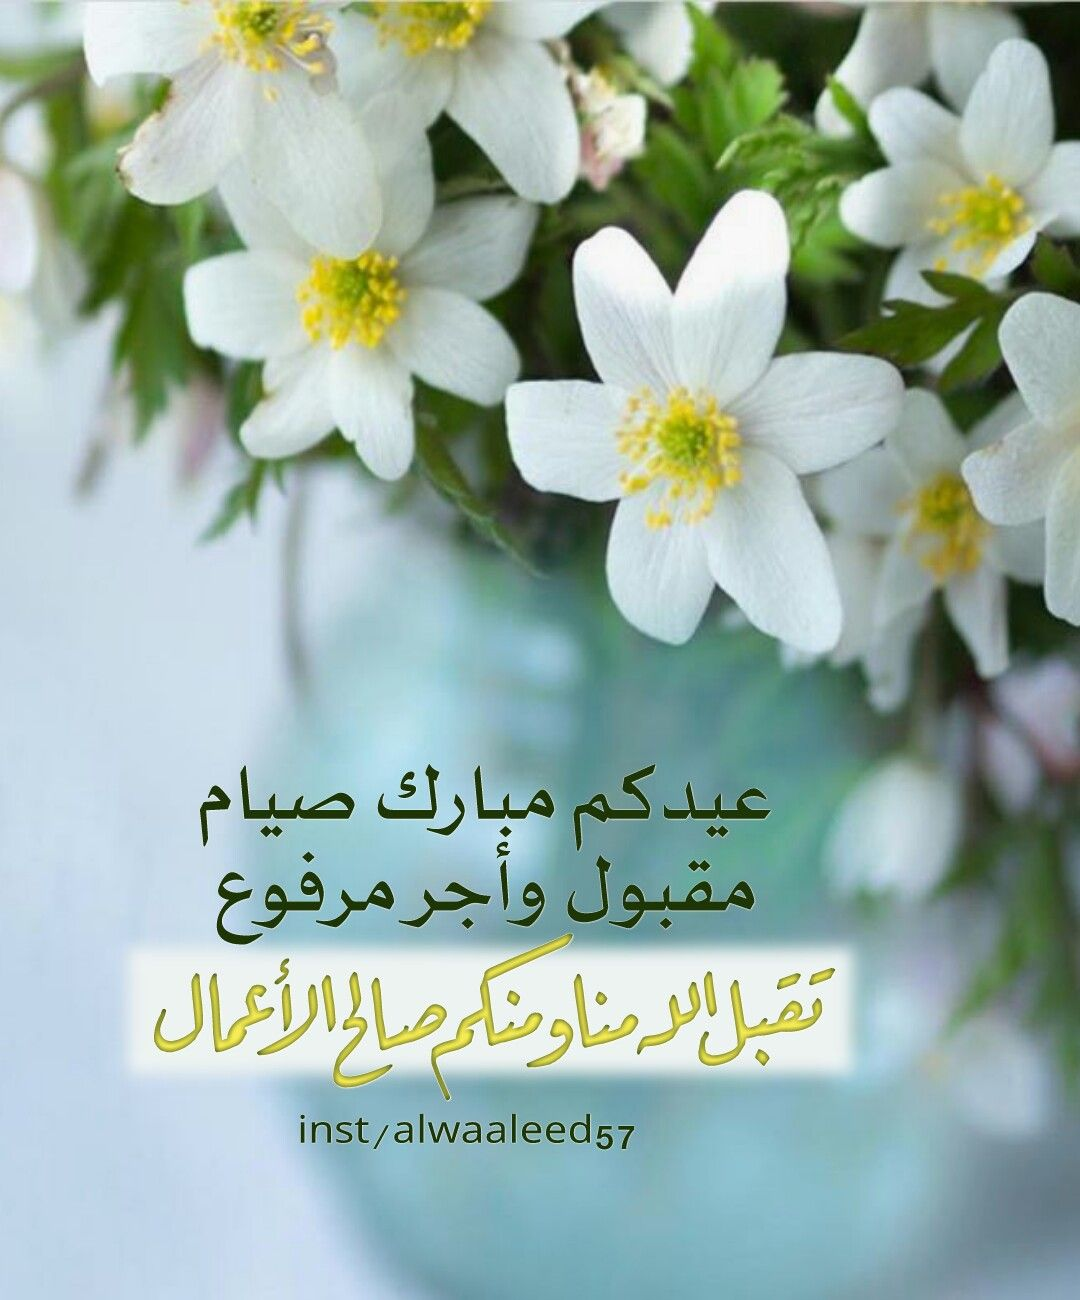 Pin By Um Ahmad On صور تهنئة Eid Greetings Happy Eid Sweet Words